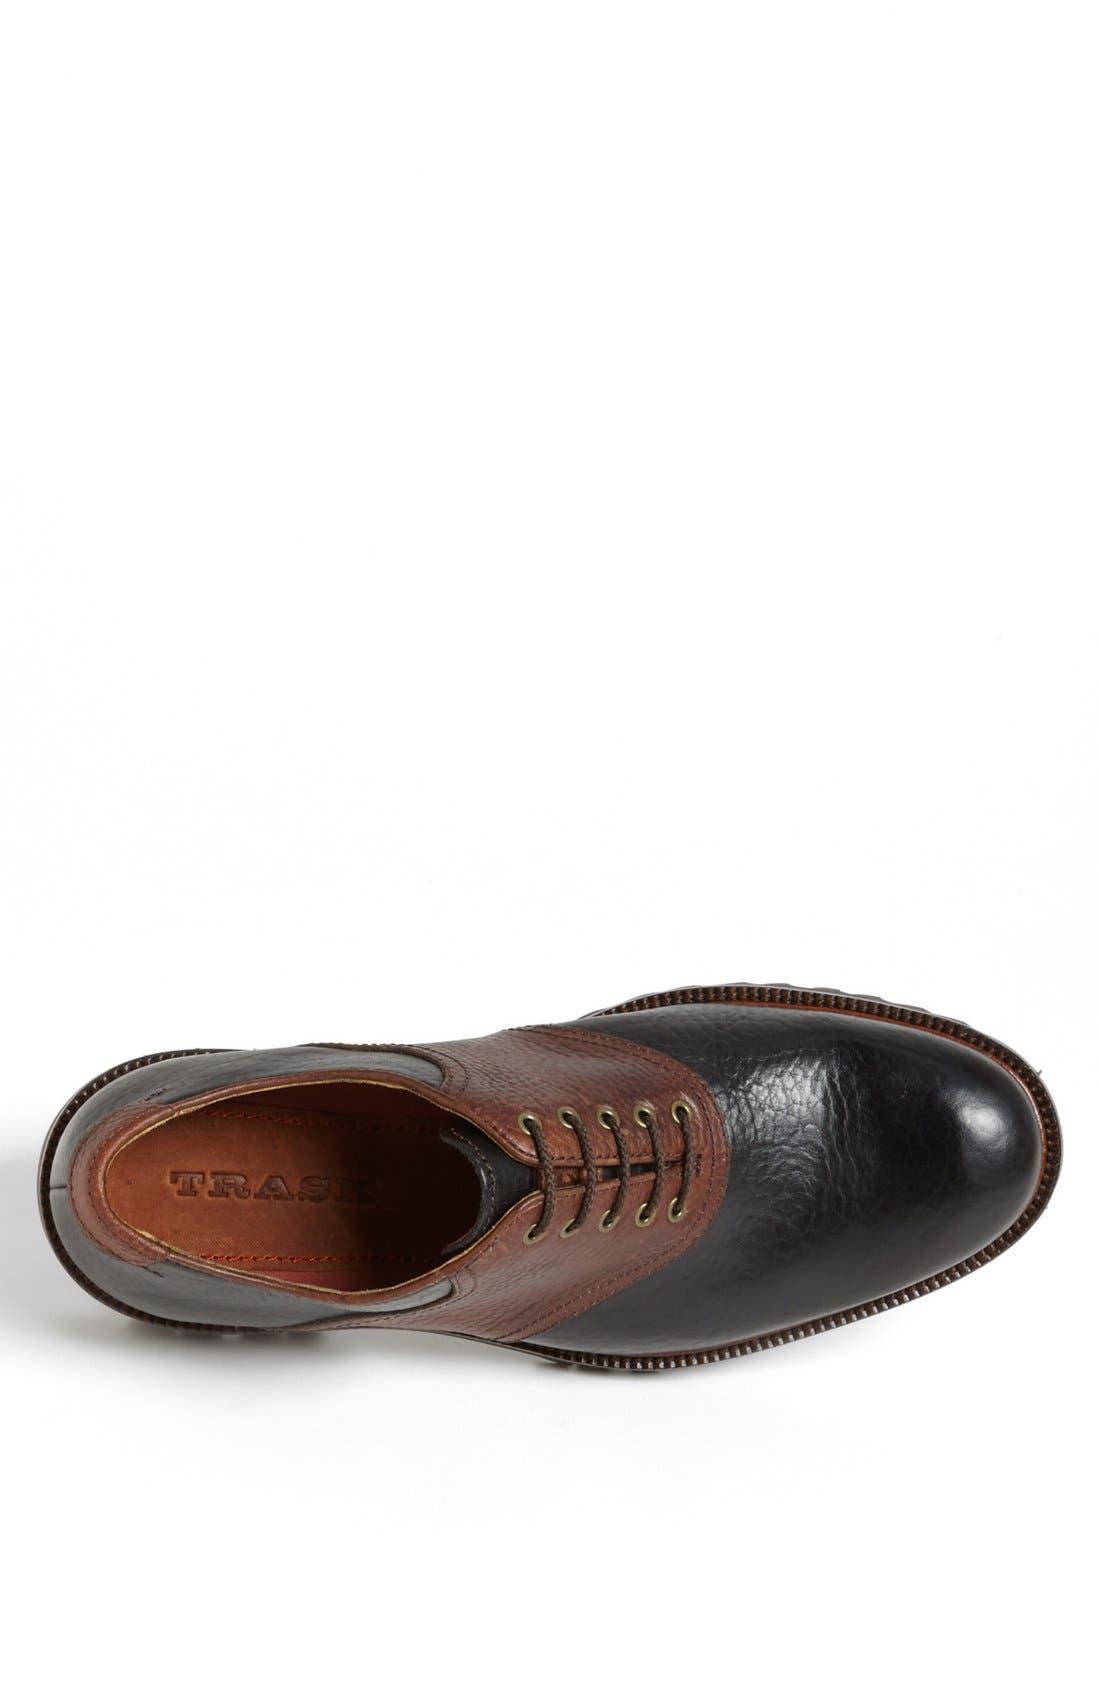 Alternate Image 3  - Trask 'Garland' Saddle Shoe (Men)